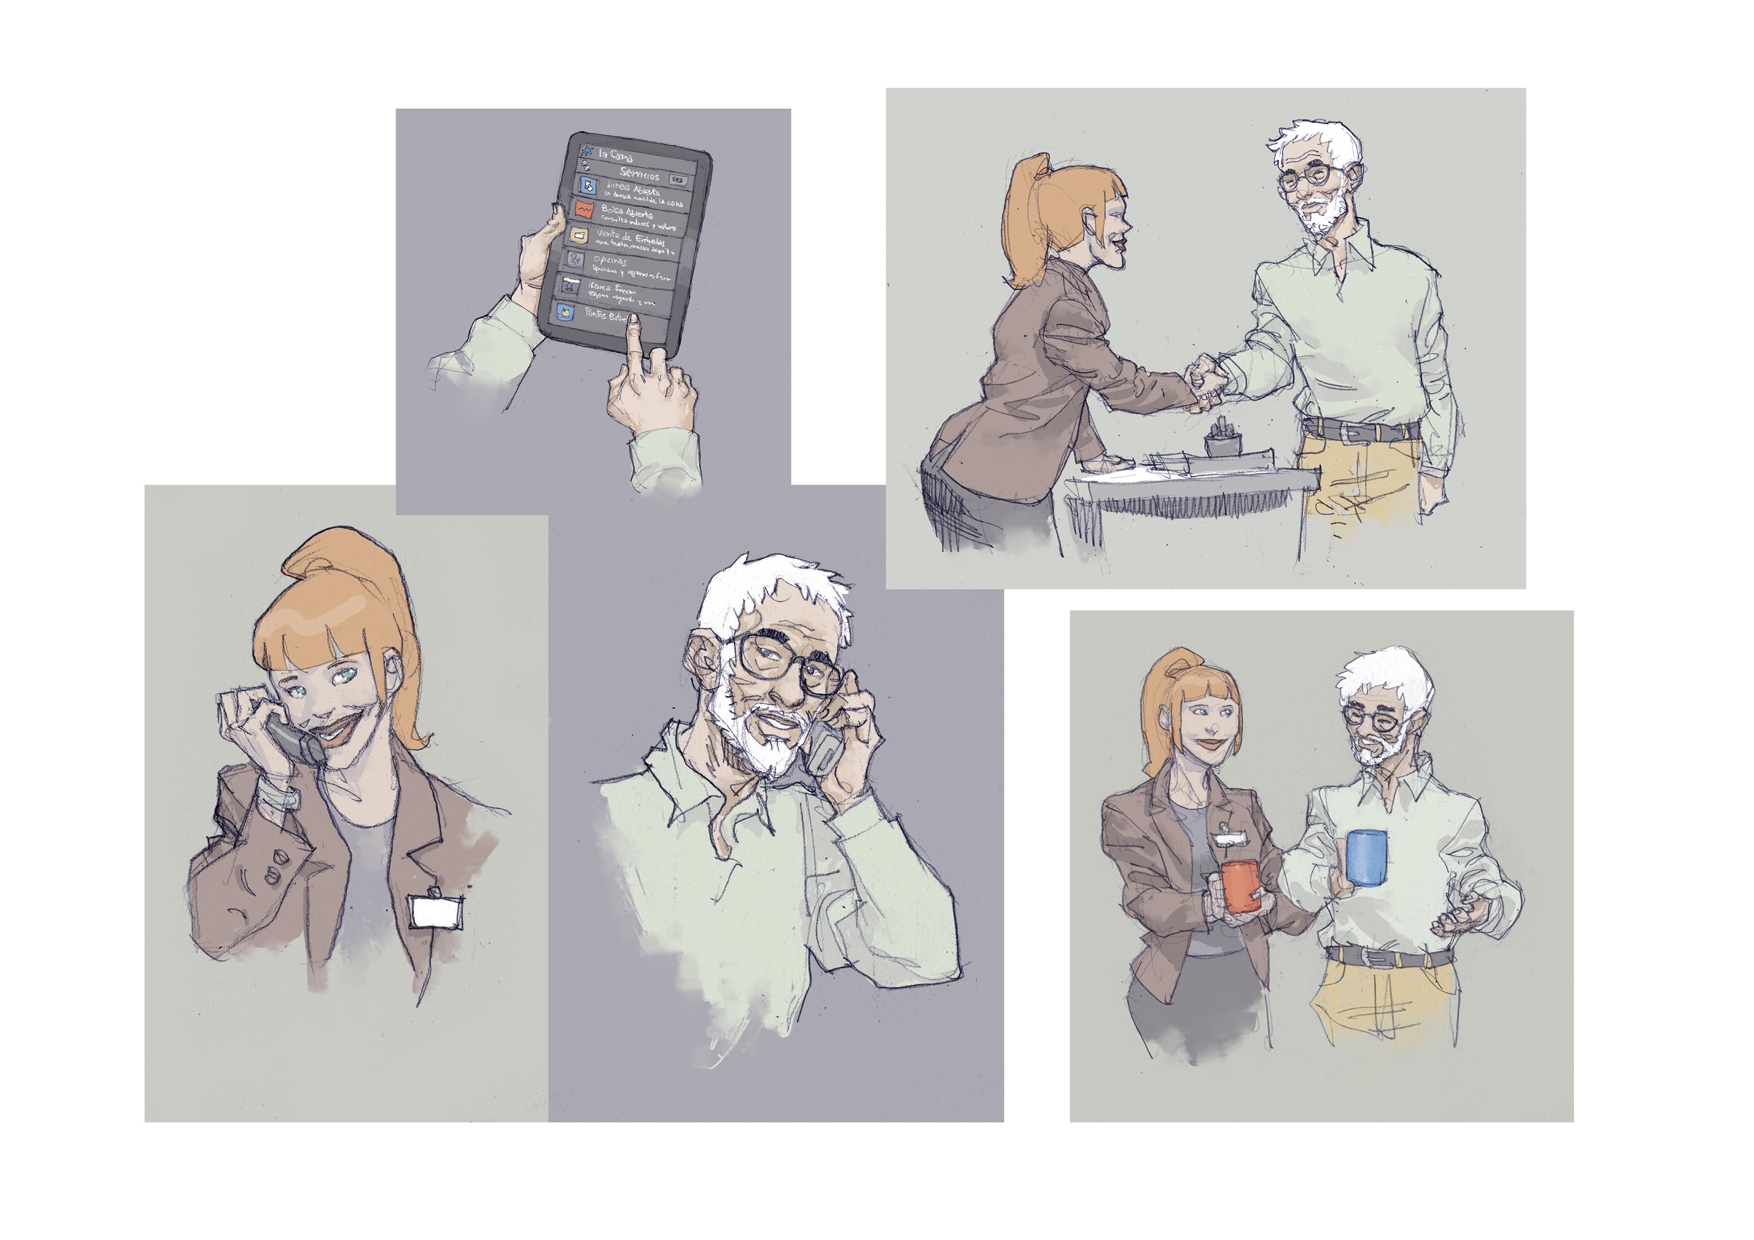 Storyboards-concept - storyboards y concept art